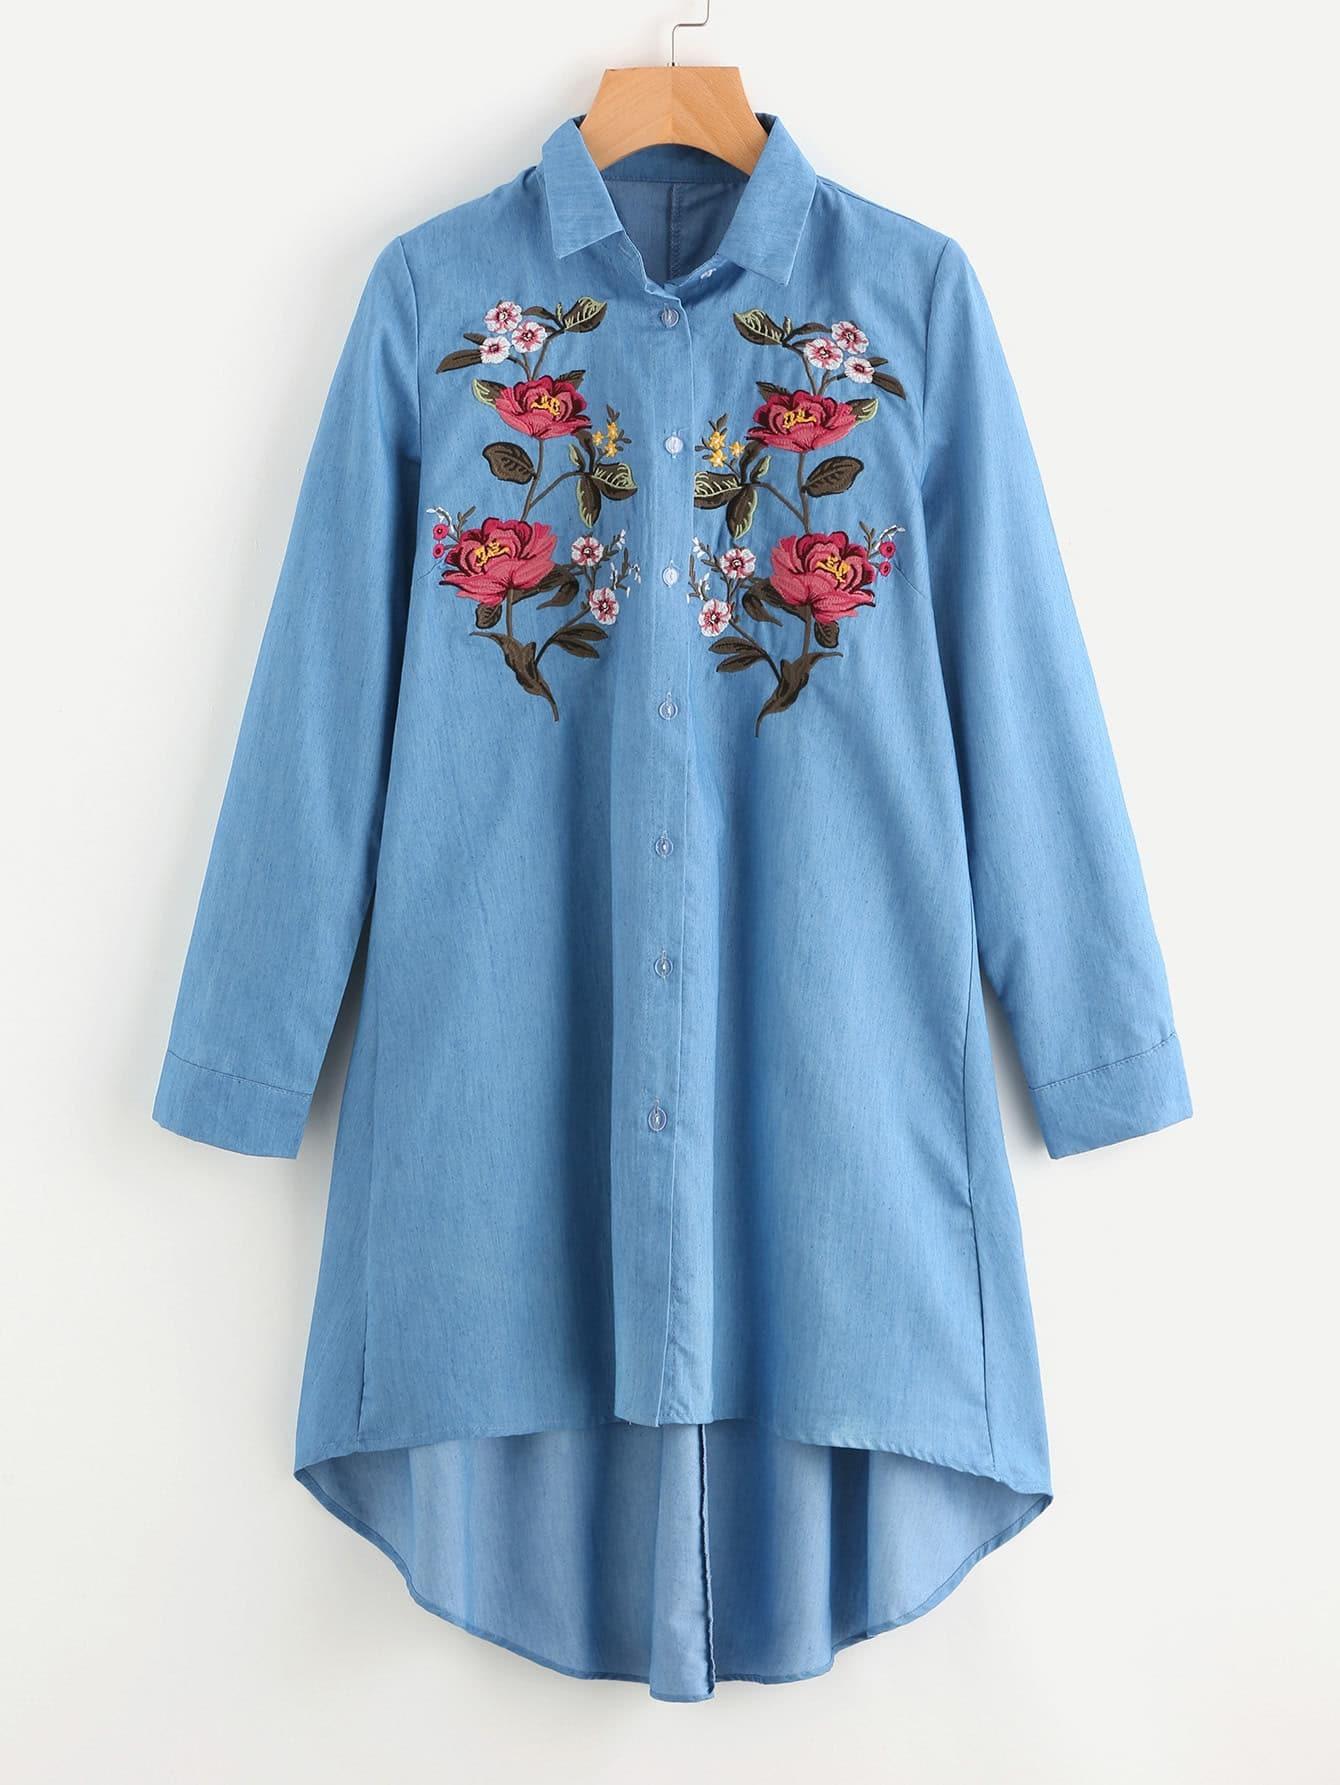 Image of Flower Embroidered Front Denim Shirt Dress